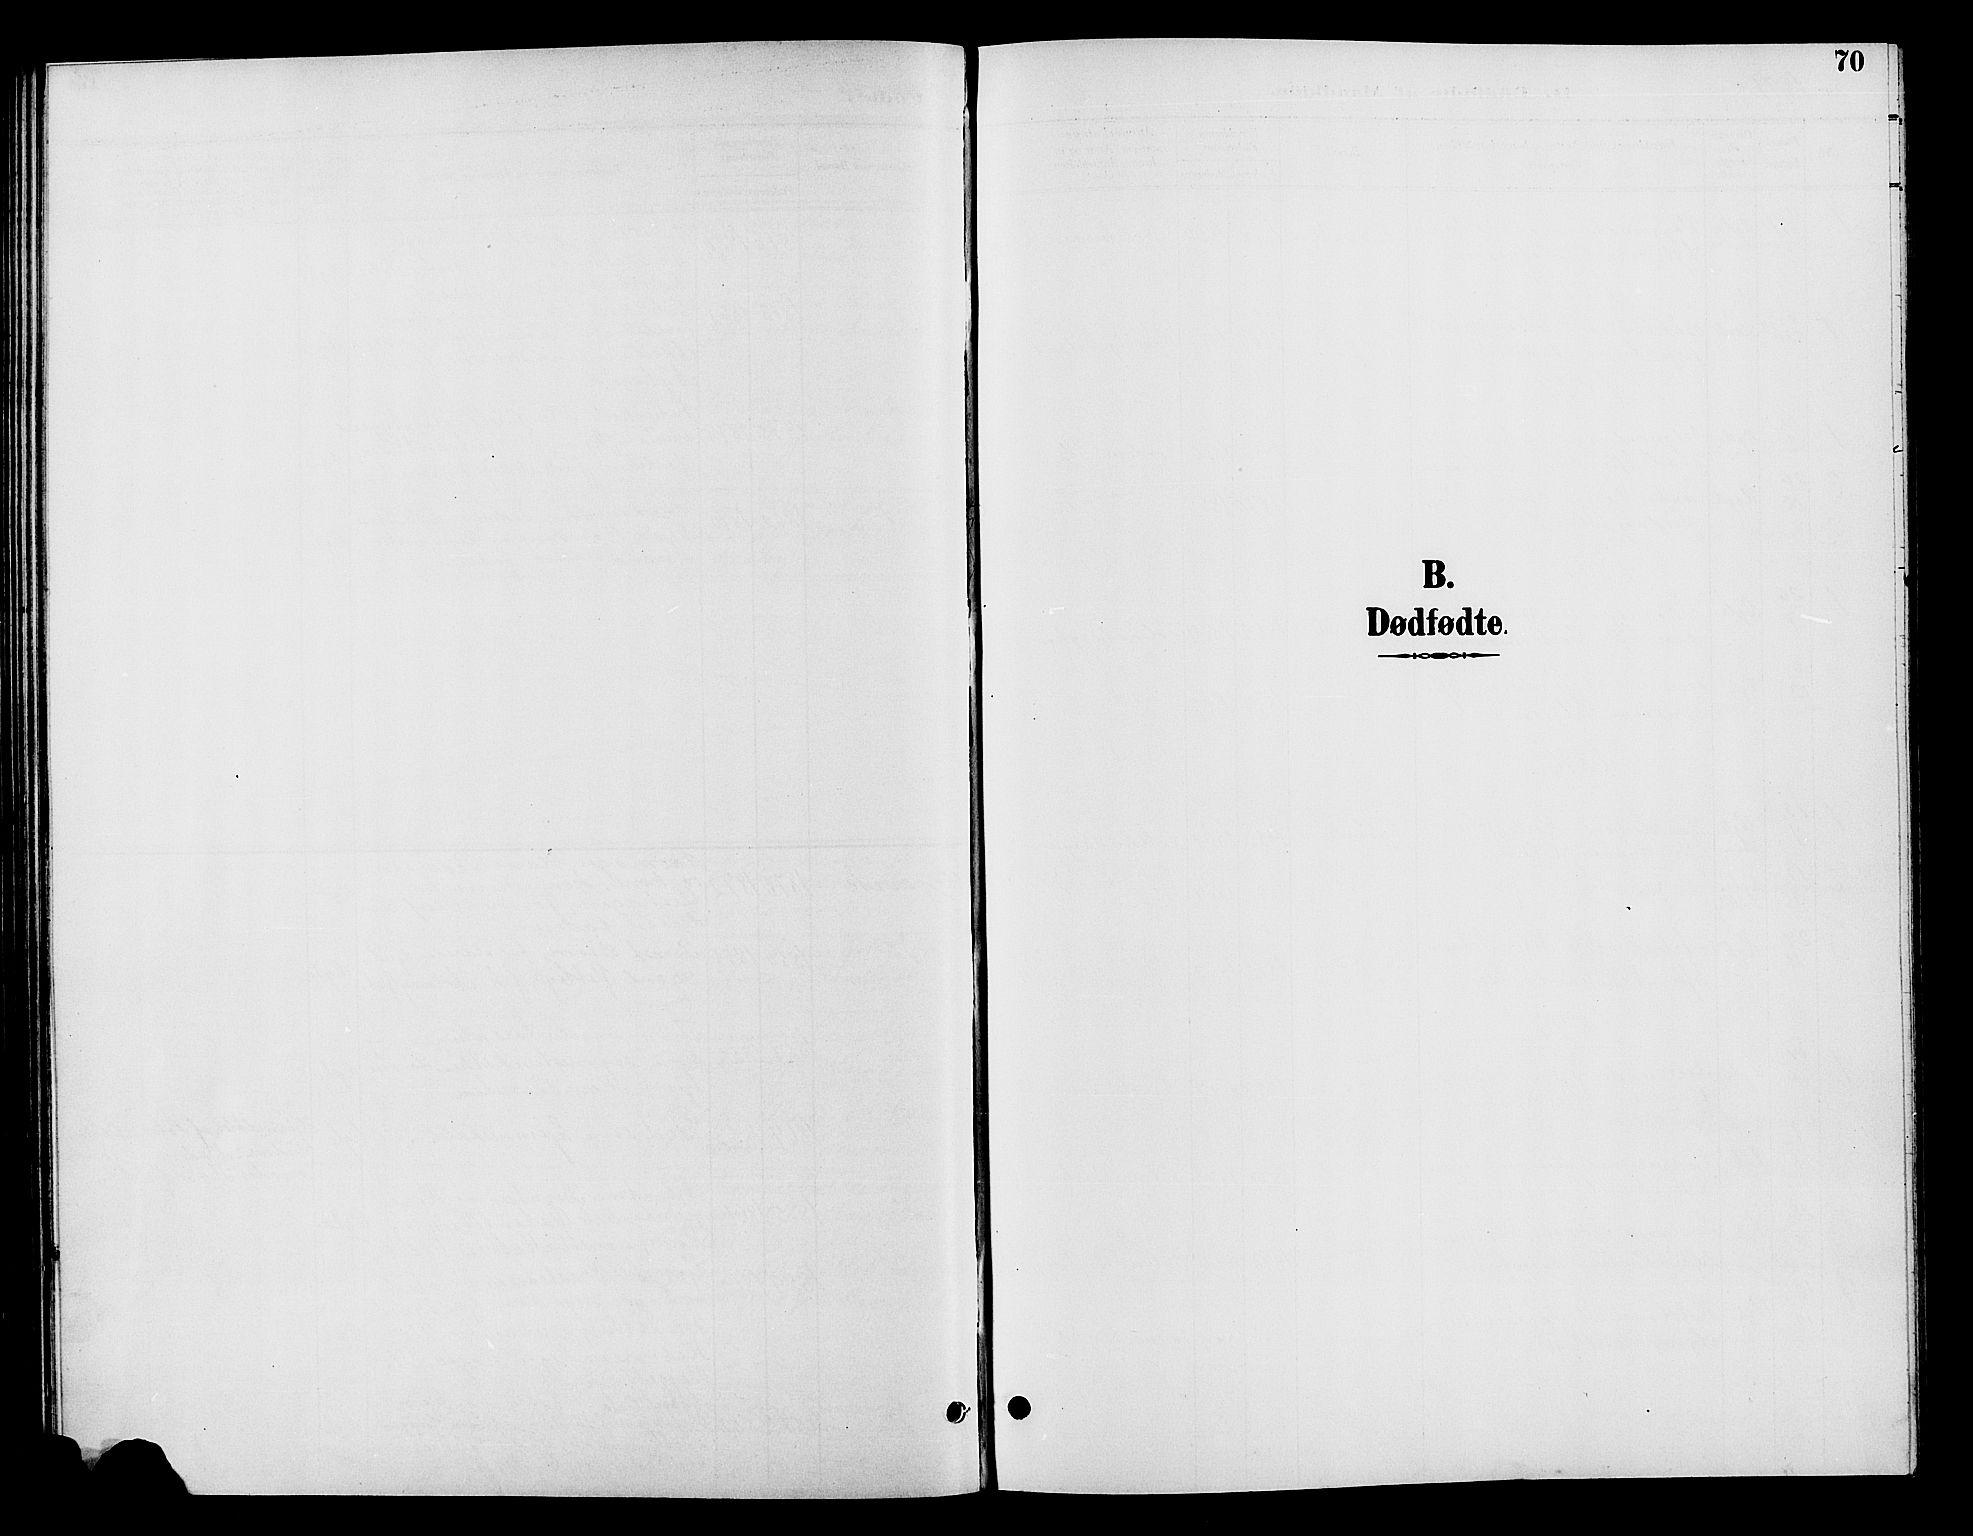 SAH, Vardal prestekontor, H/Ha/Hab/L0009: Klokkerbok nr. 9, 1894-1902, s. 70